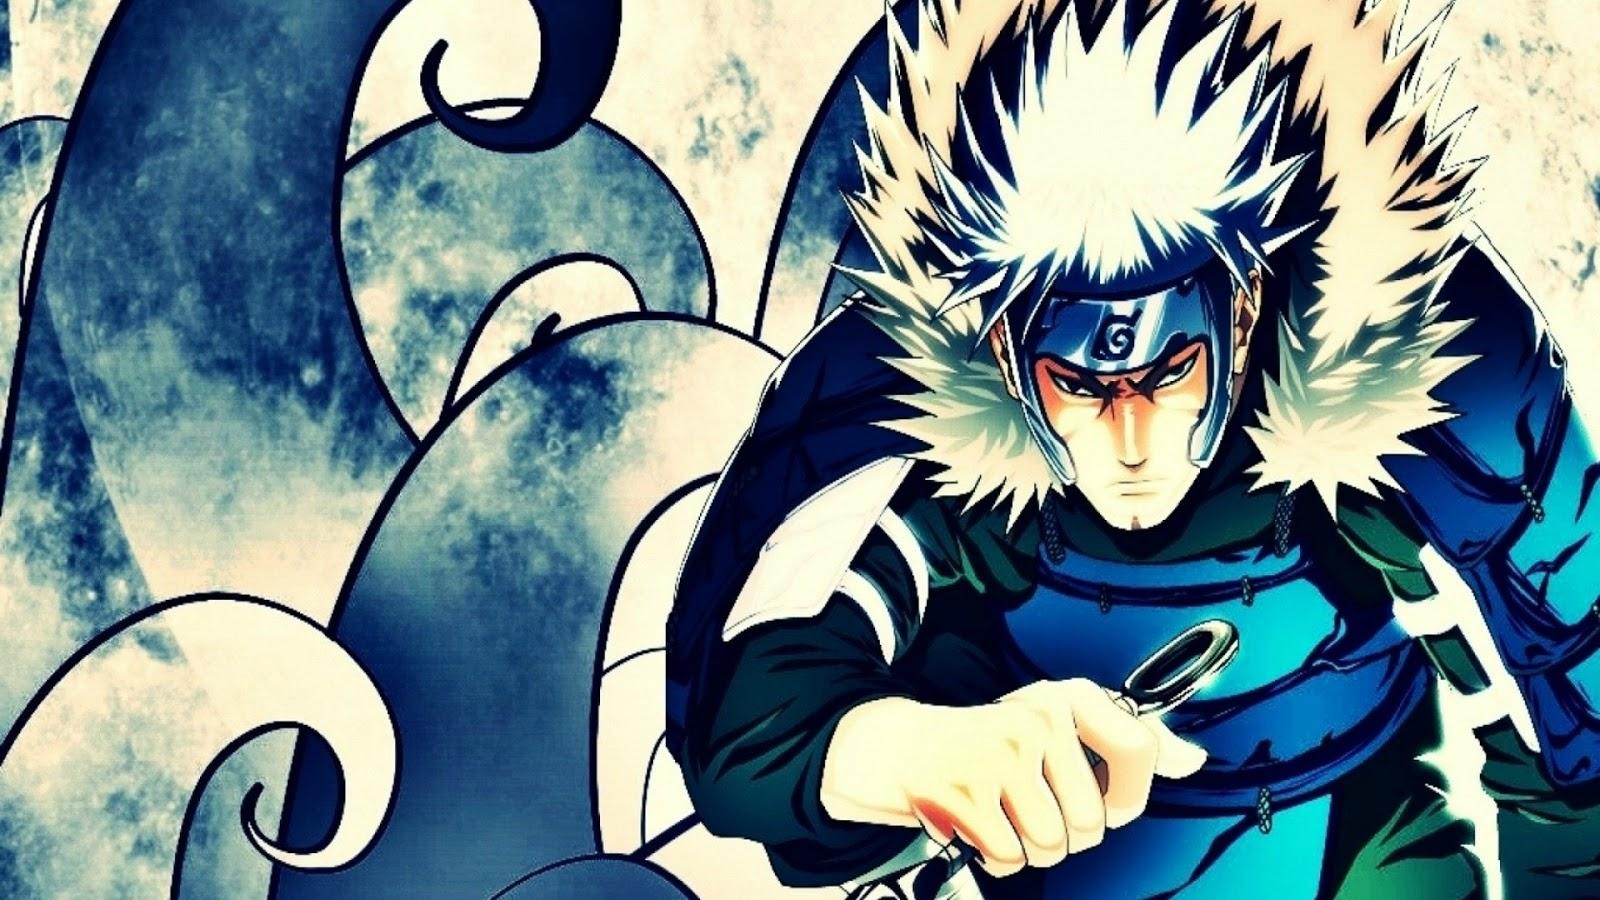 Download gambar wallpaper naruto gudang wallpaper - Foto anime keren hd ...